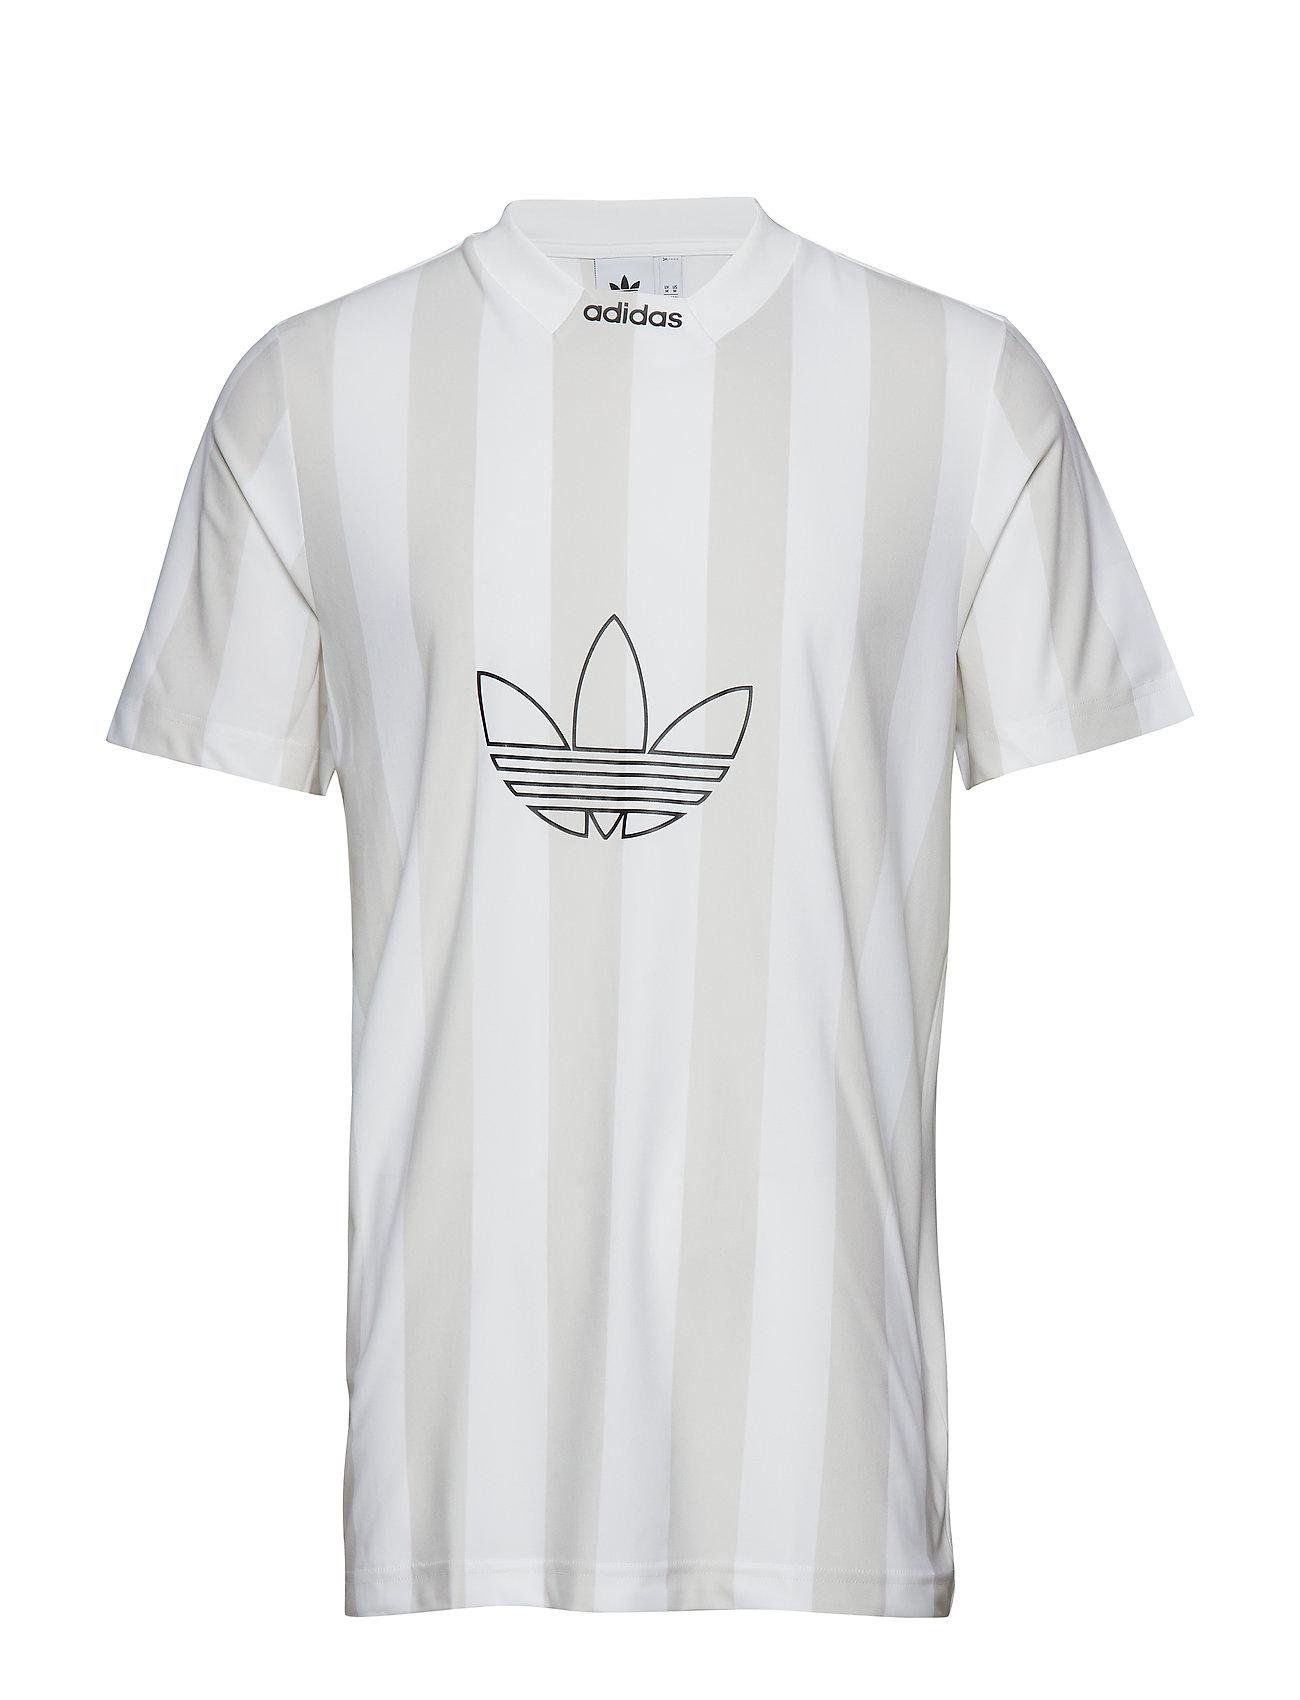 Adidas Originals ES PLY JERSEY Ögrönlar